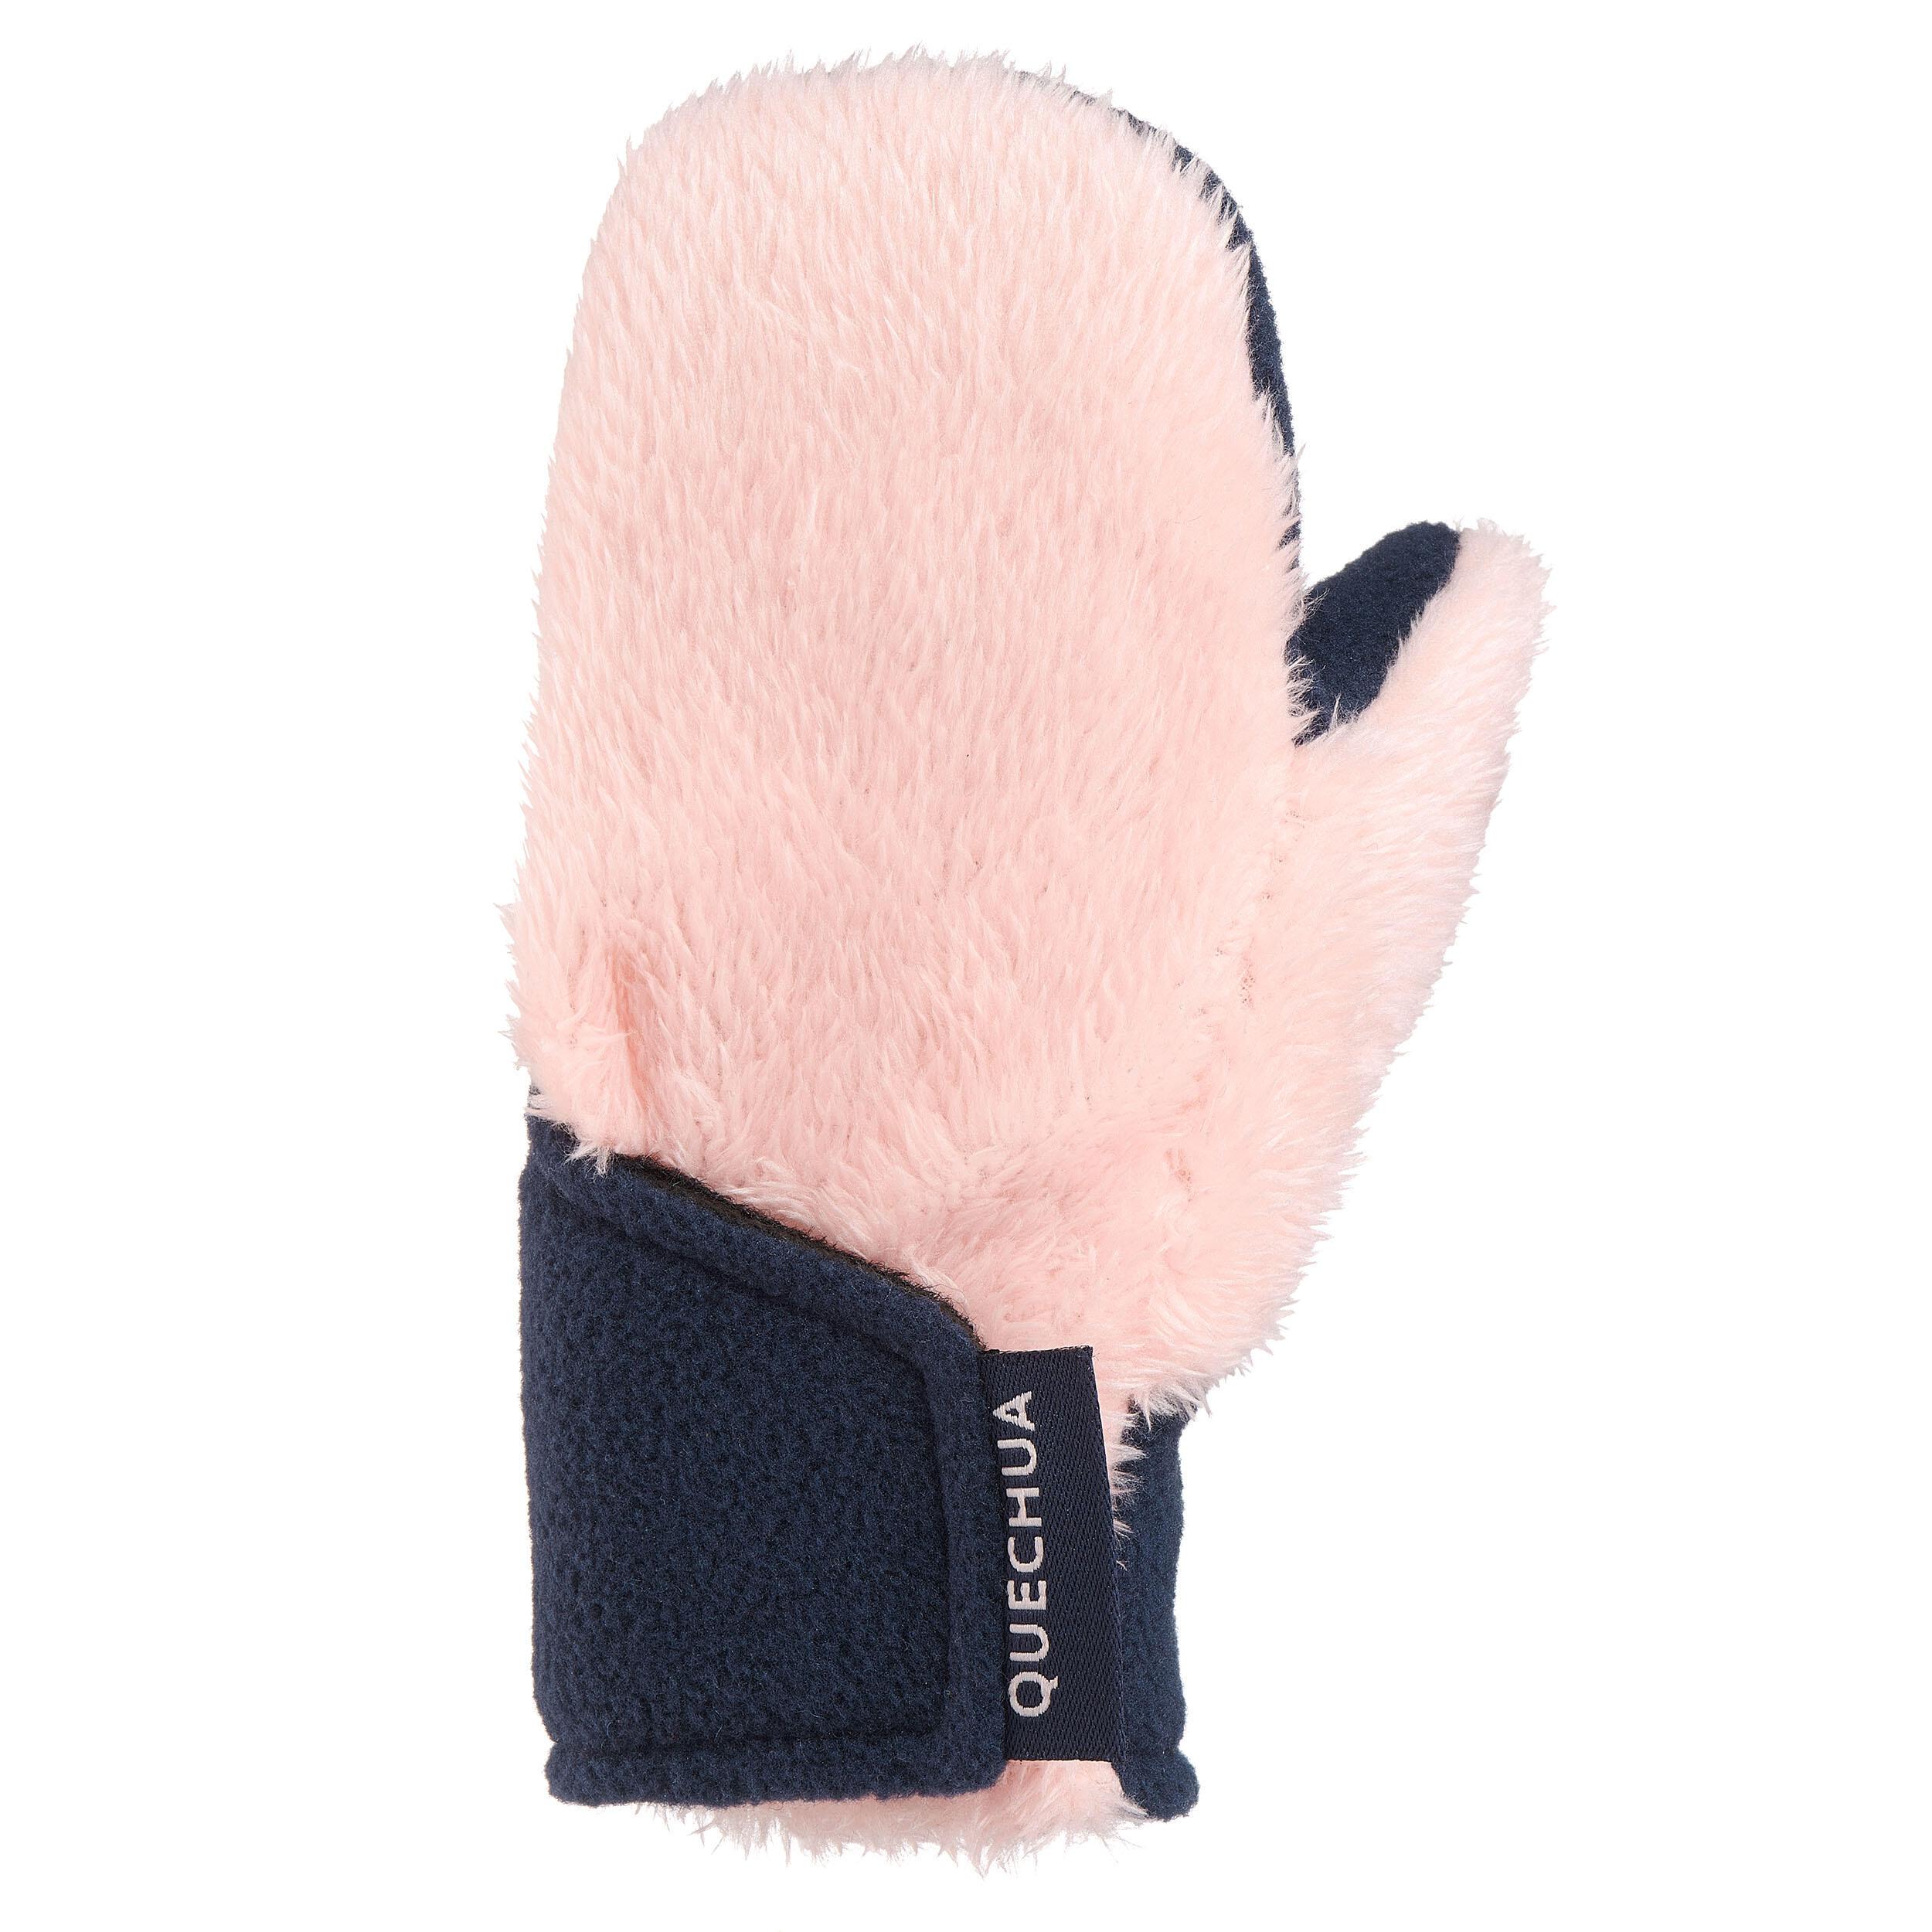 Mănuși Polar SH100 Roz Copii imagine produs